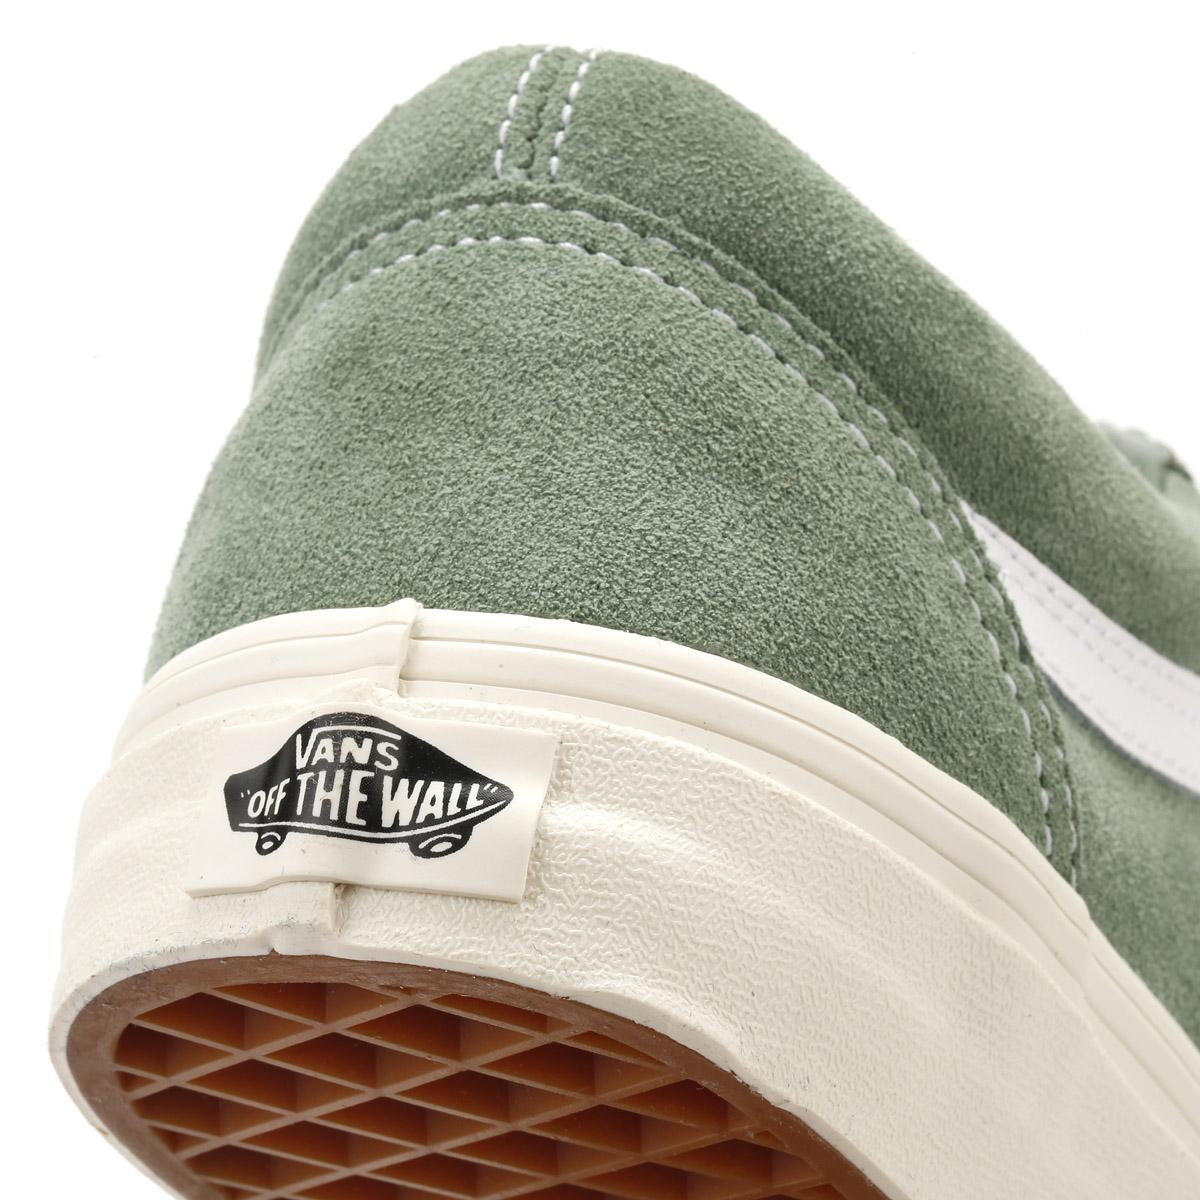 866af8c4cca0 Lyst - Vans Womens Green   True White Retro Sport Suede Old Skool ...